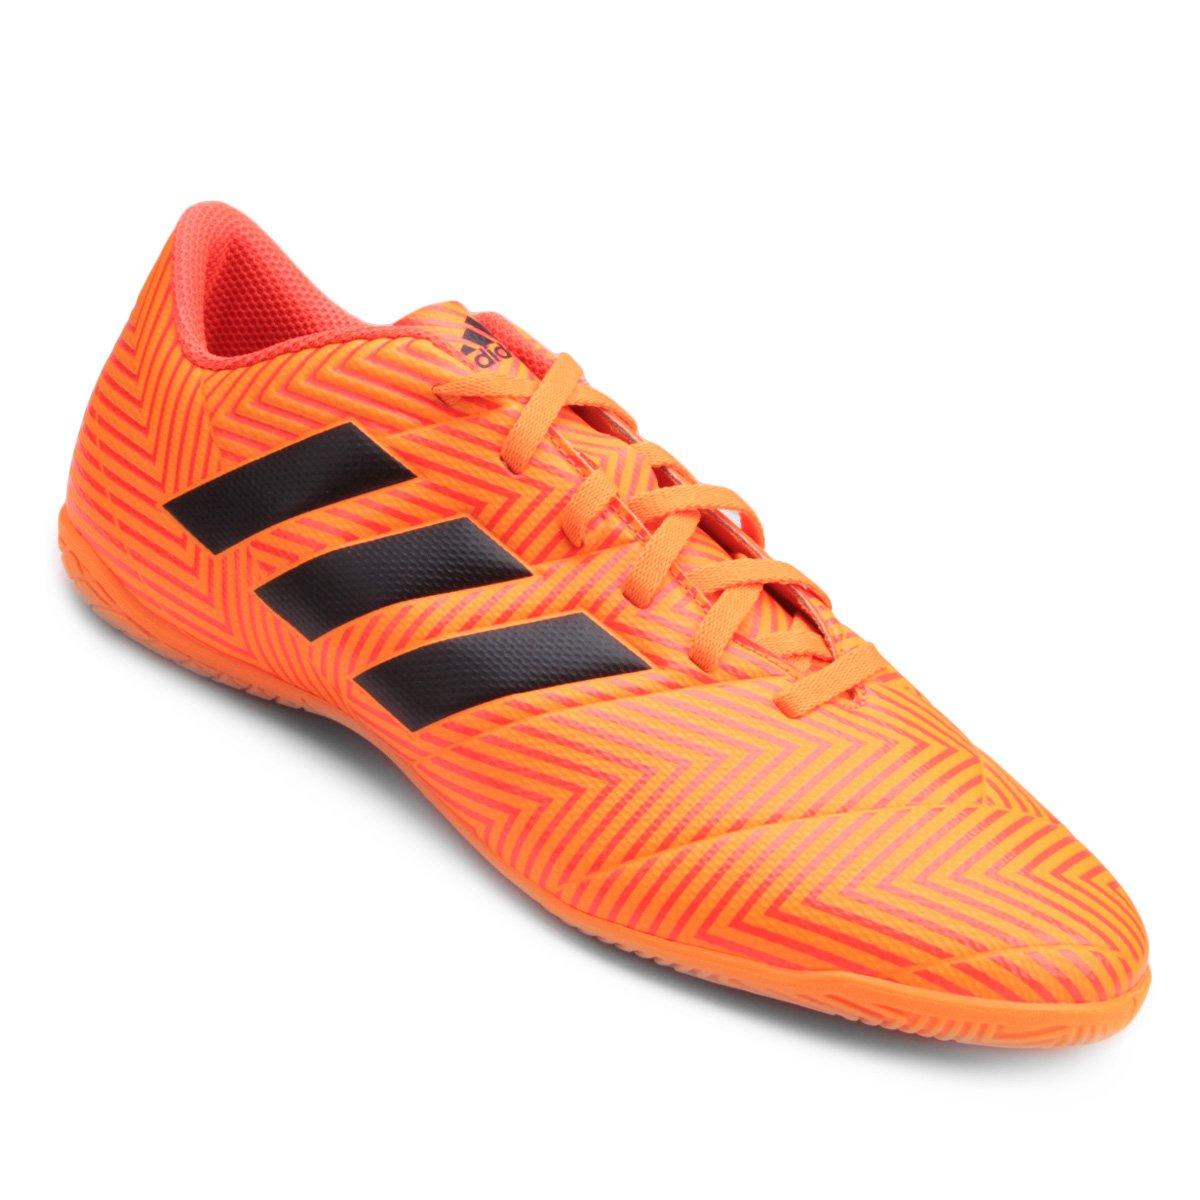 8c638539b17c9 Chuteira Futsal Adidas Nemeziz Tango 18 4 IN - Laranja e Preto | São Paulo  Mania